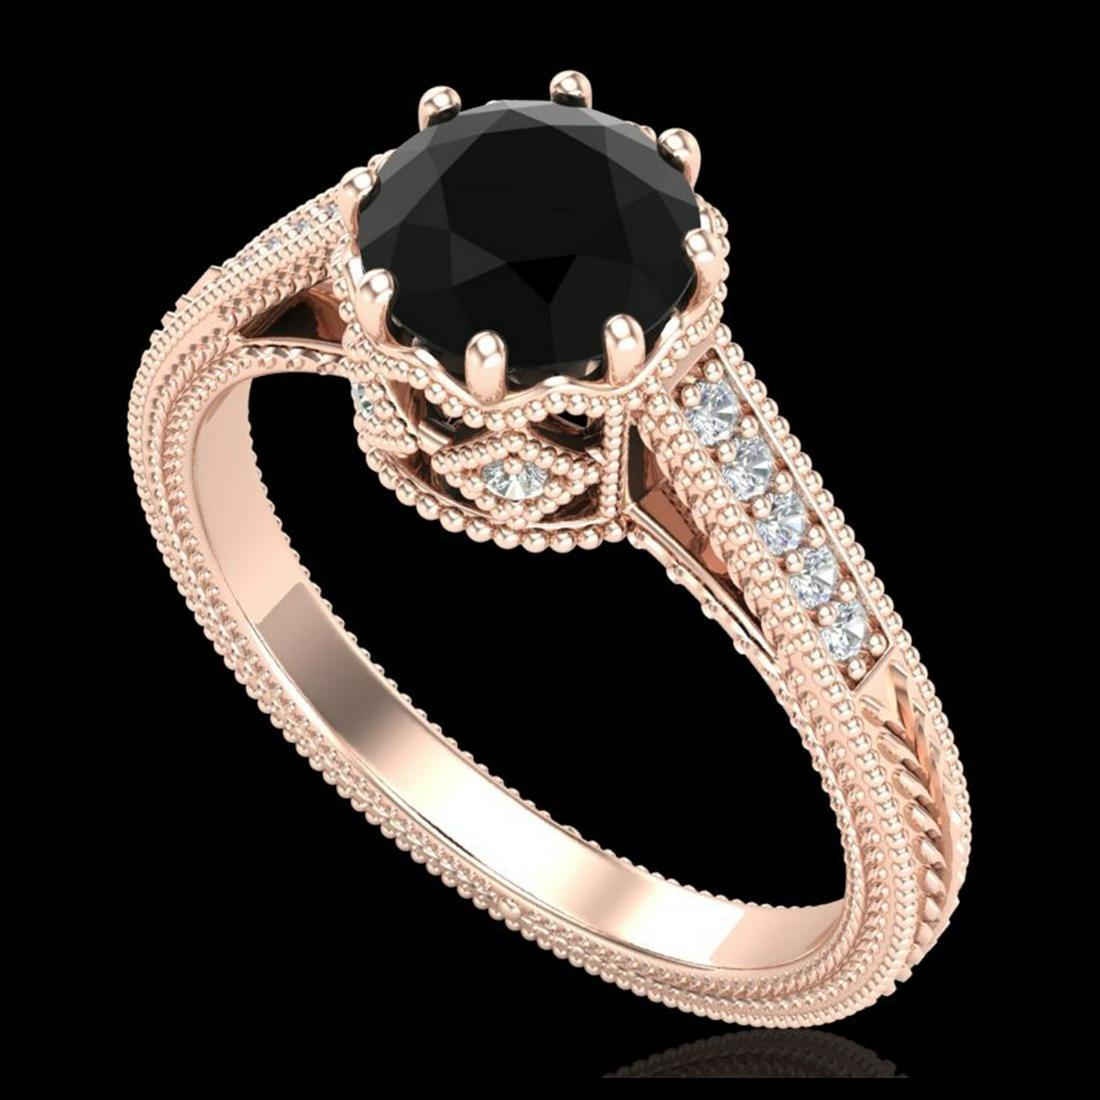 1.25 ctw Fancy Black Diamond Art Deco Ring 18K Rose